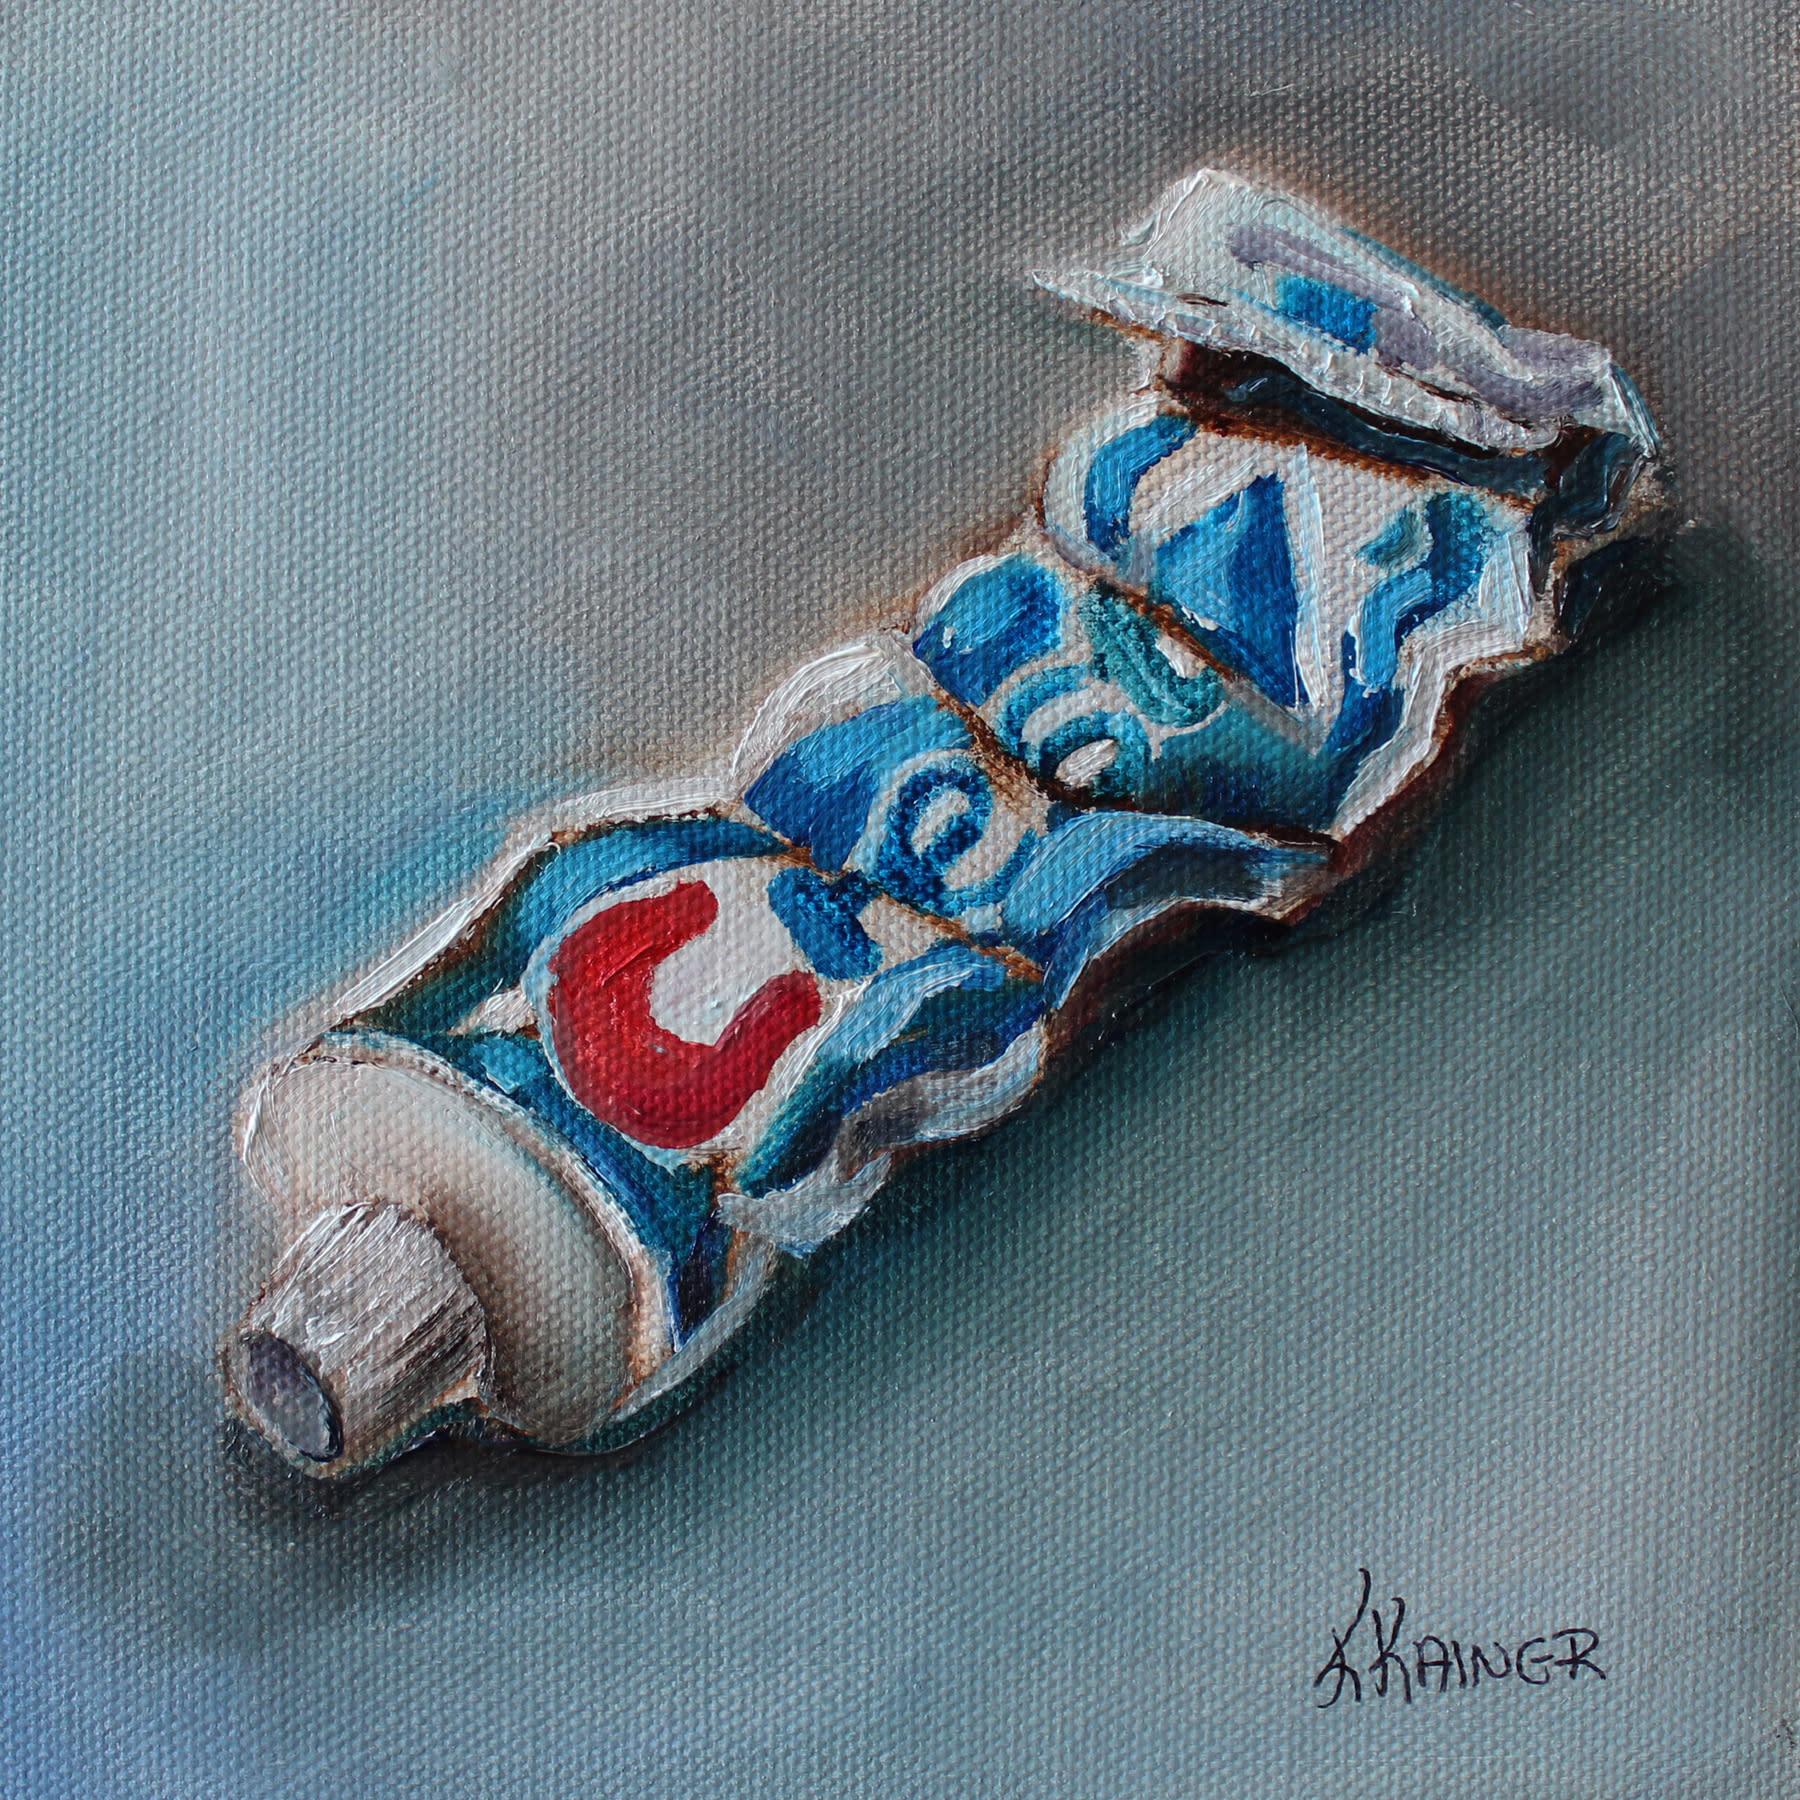 Toothpaste 300 r7ve4m